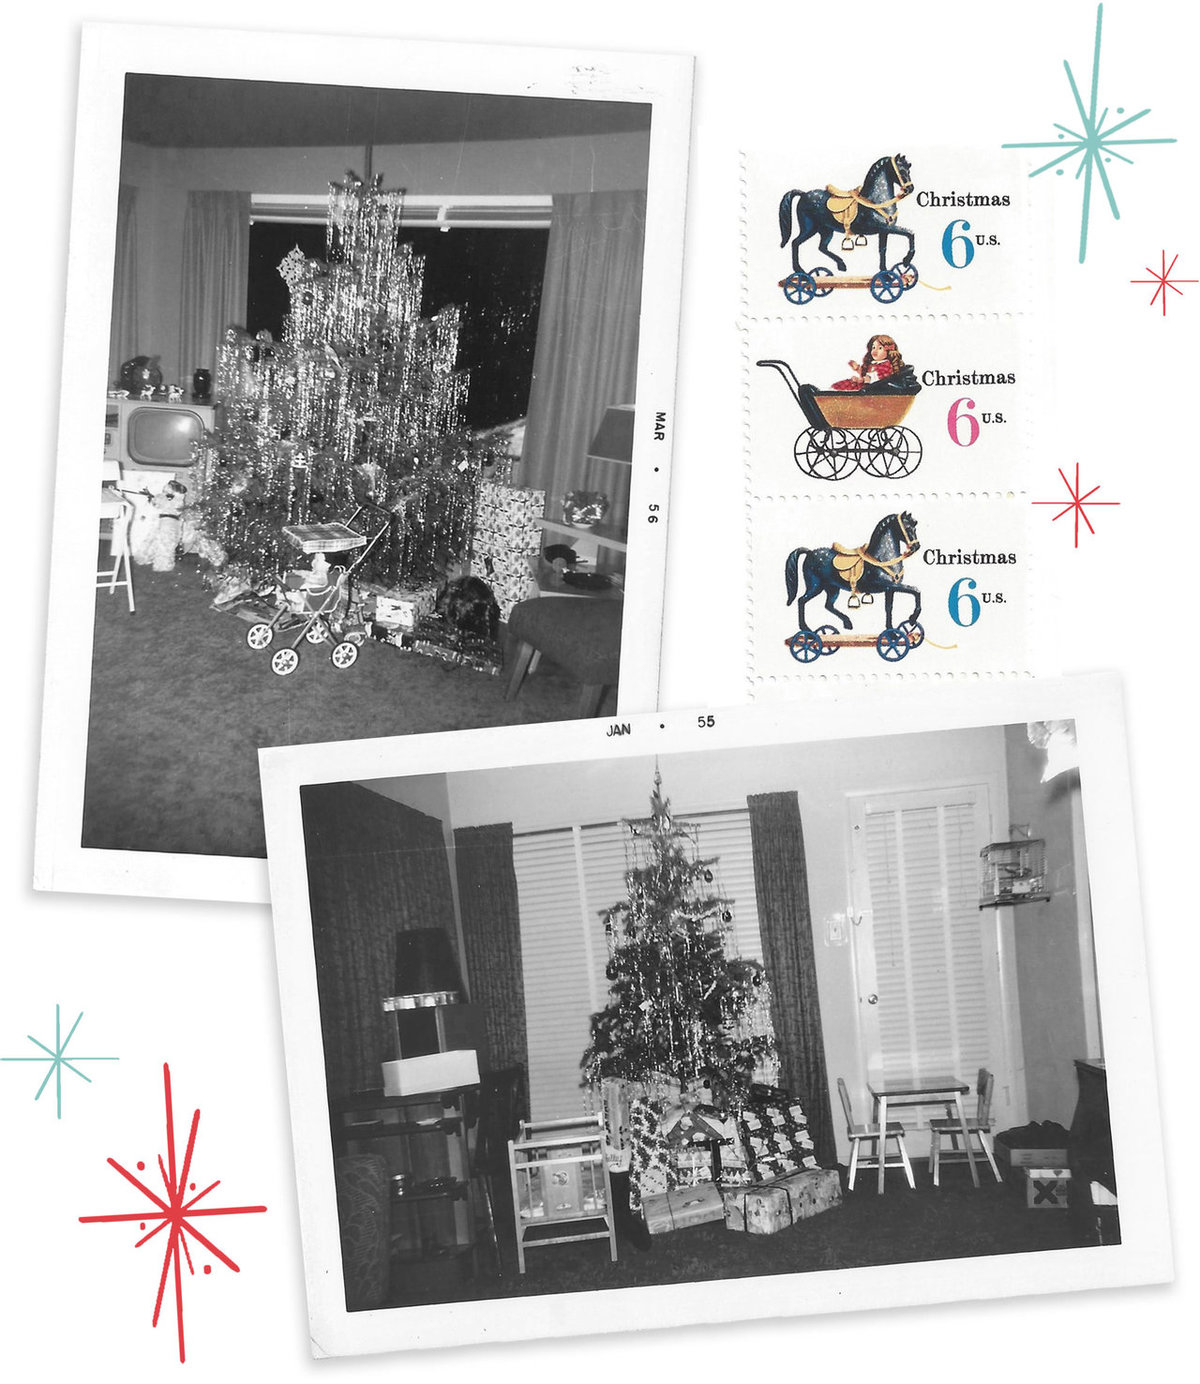 Lauren's childhood Christmas trees